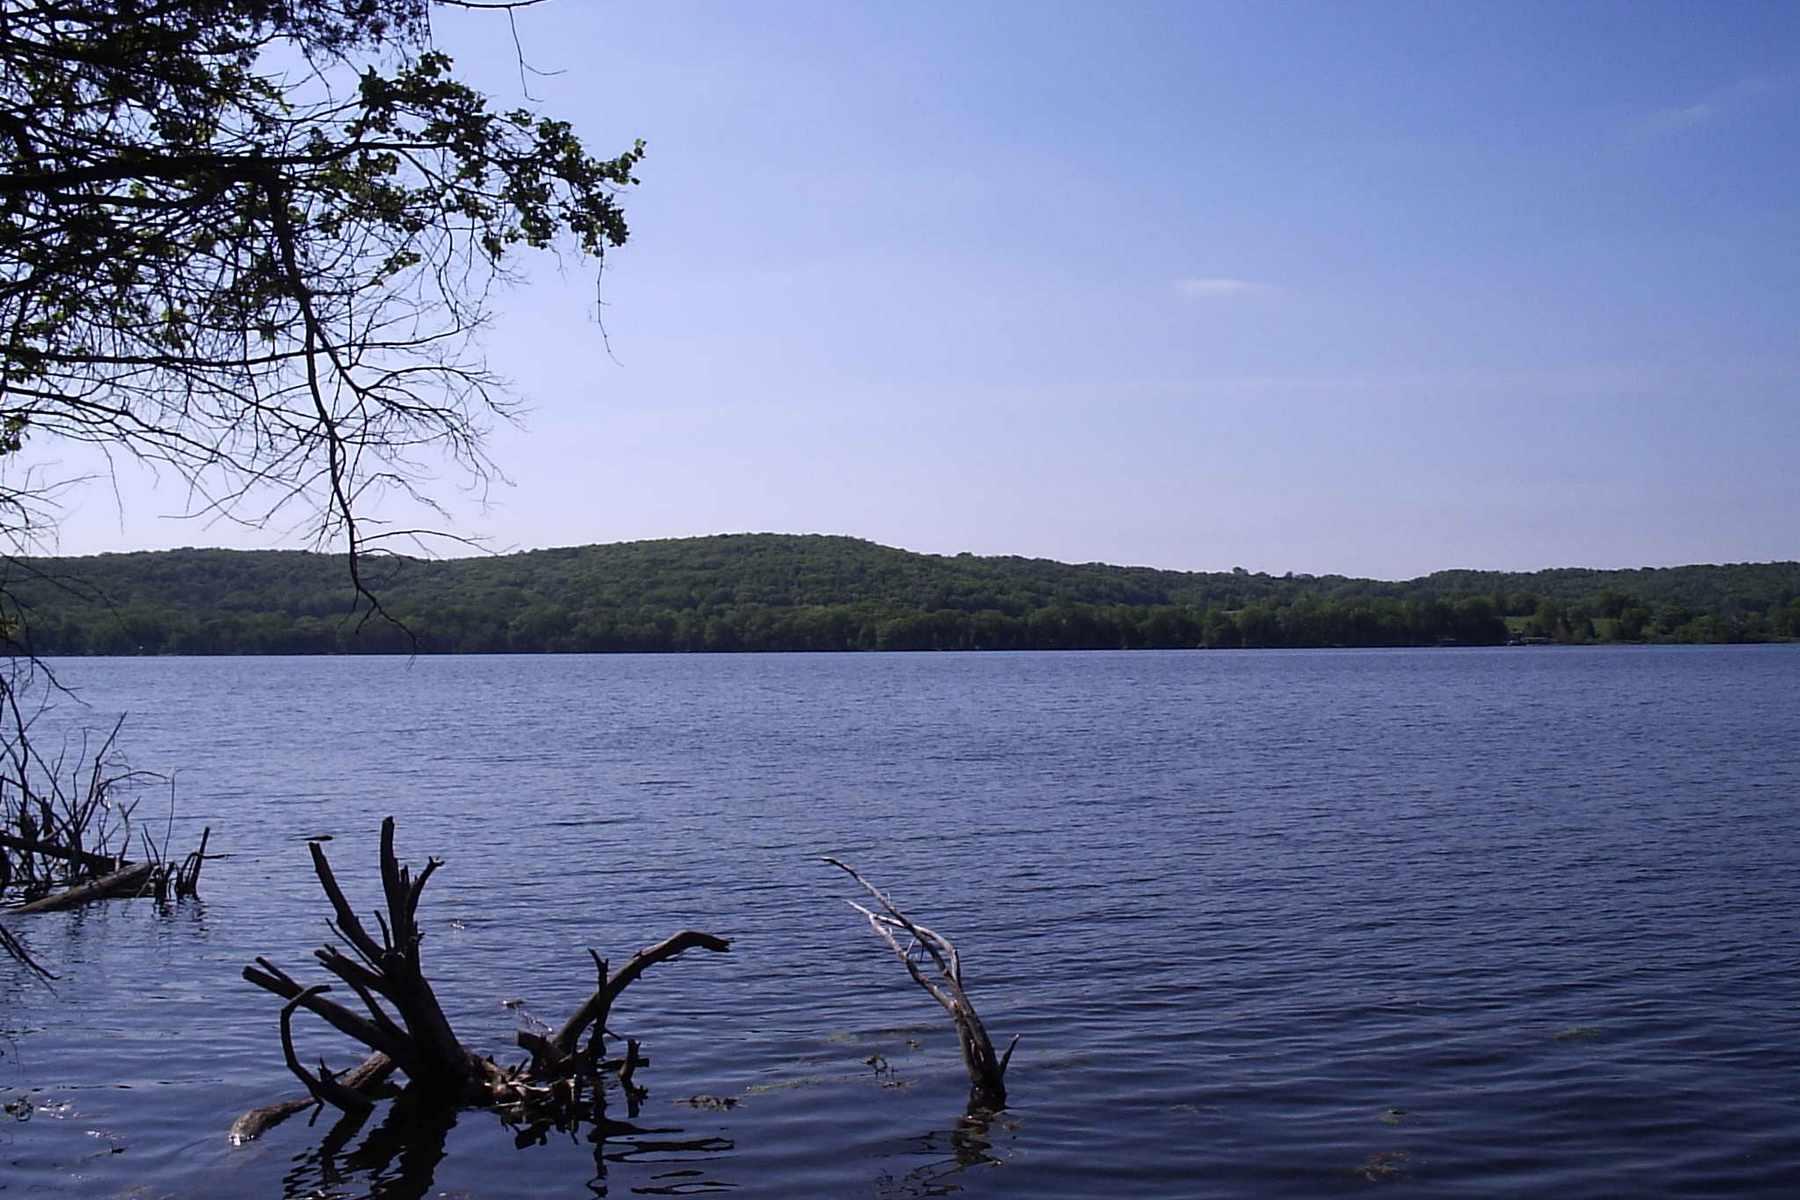 Land for Sale at Fish Lake Acreage 8679 Schoepp Rd Sauk City, Wisconsin, 53583 United States